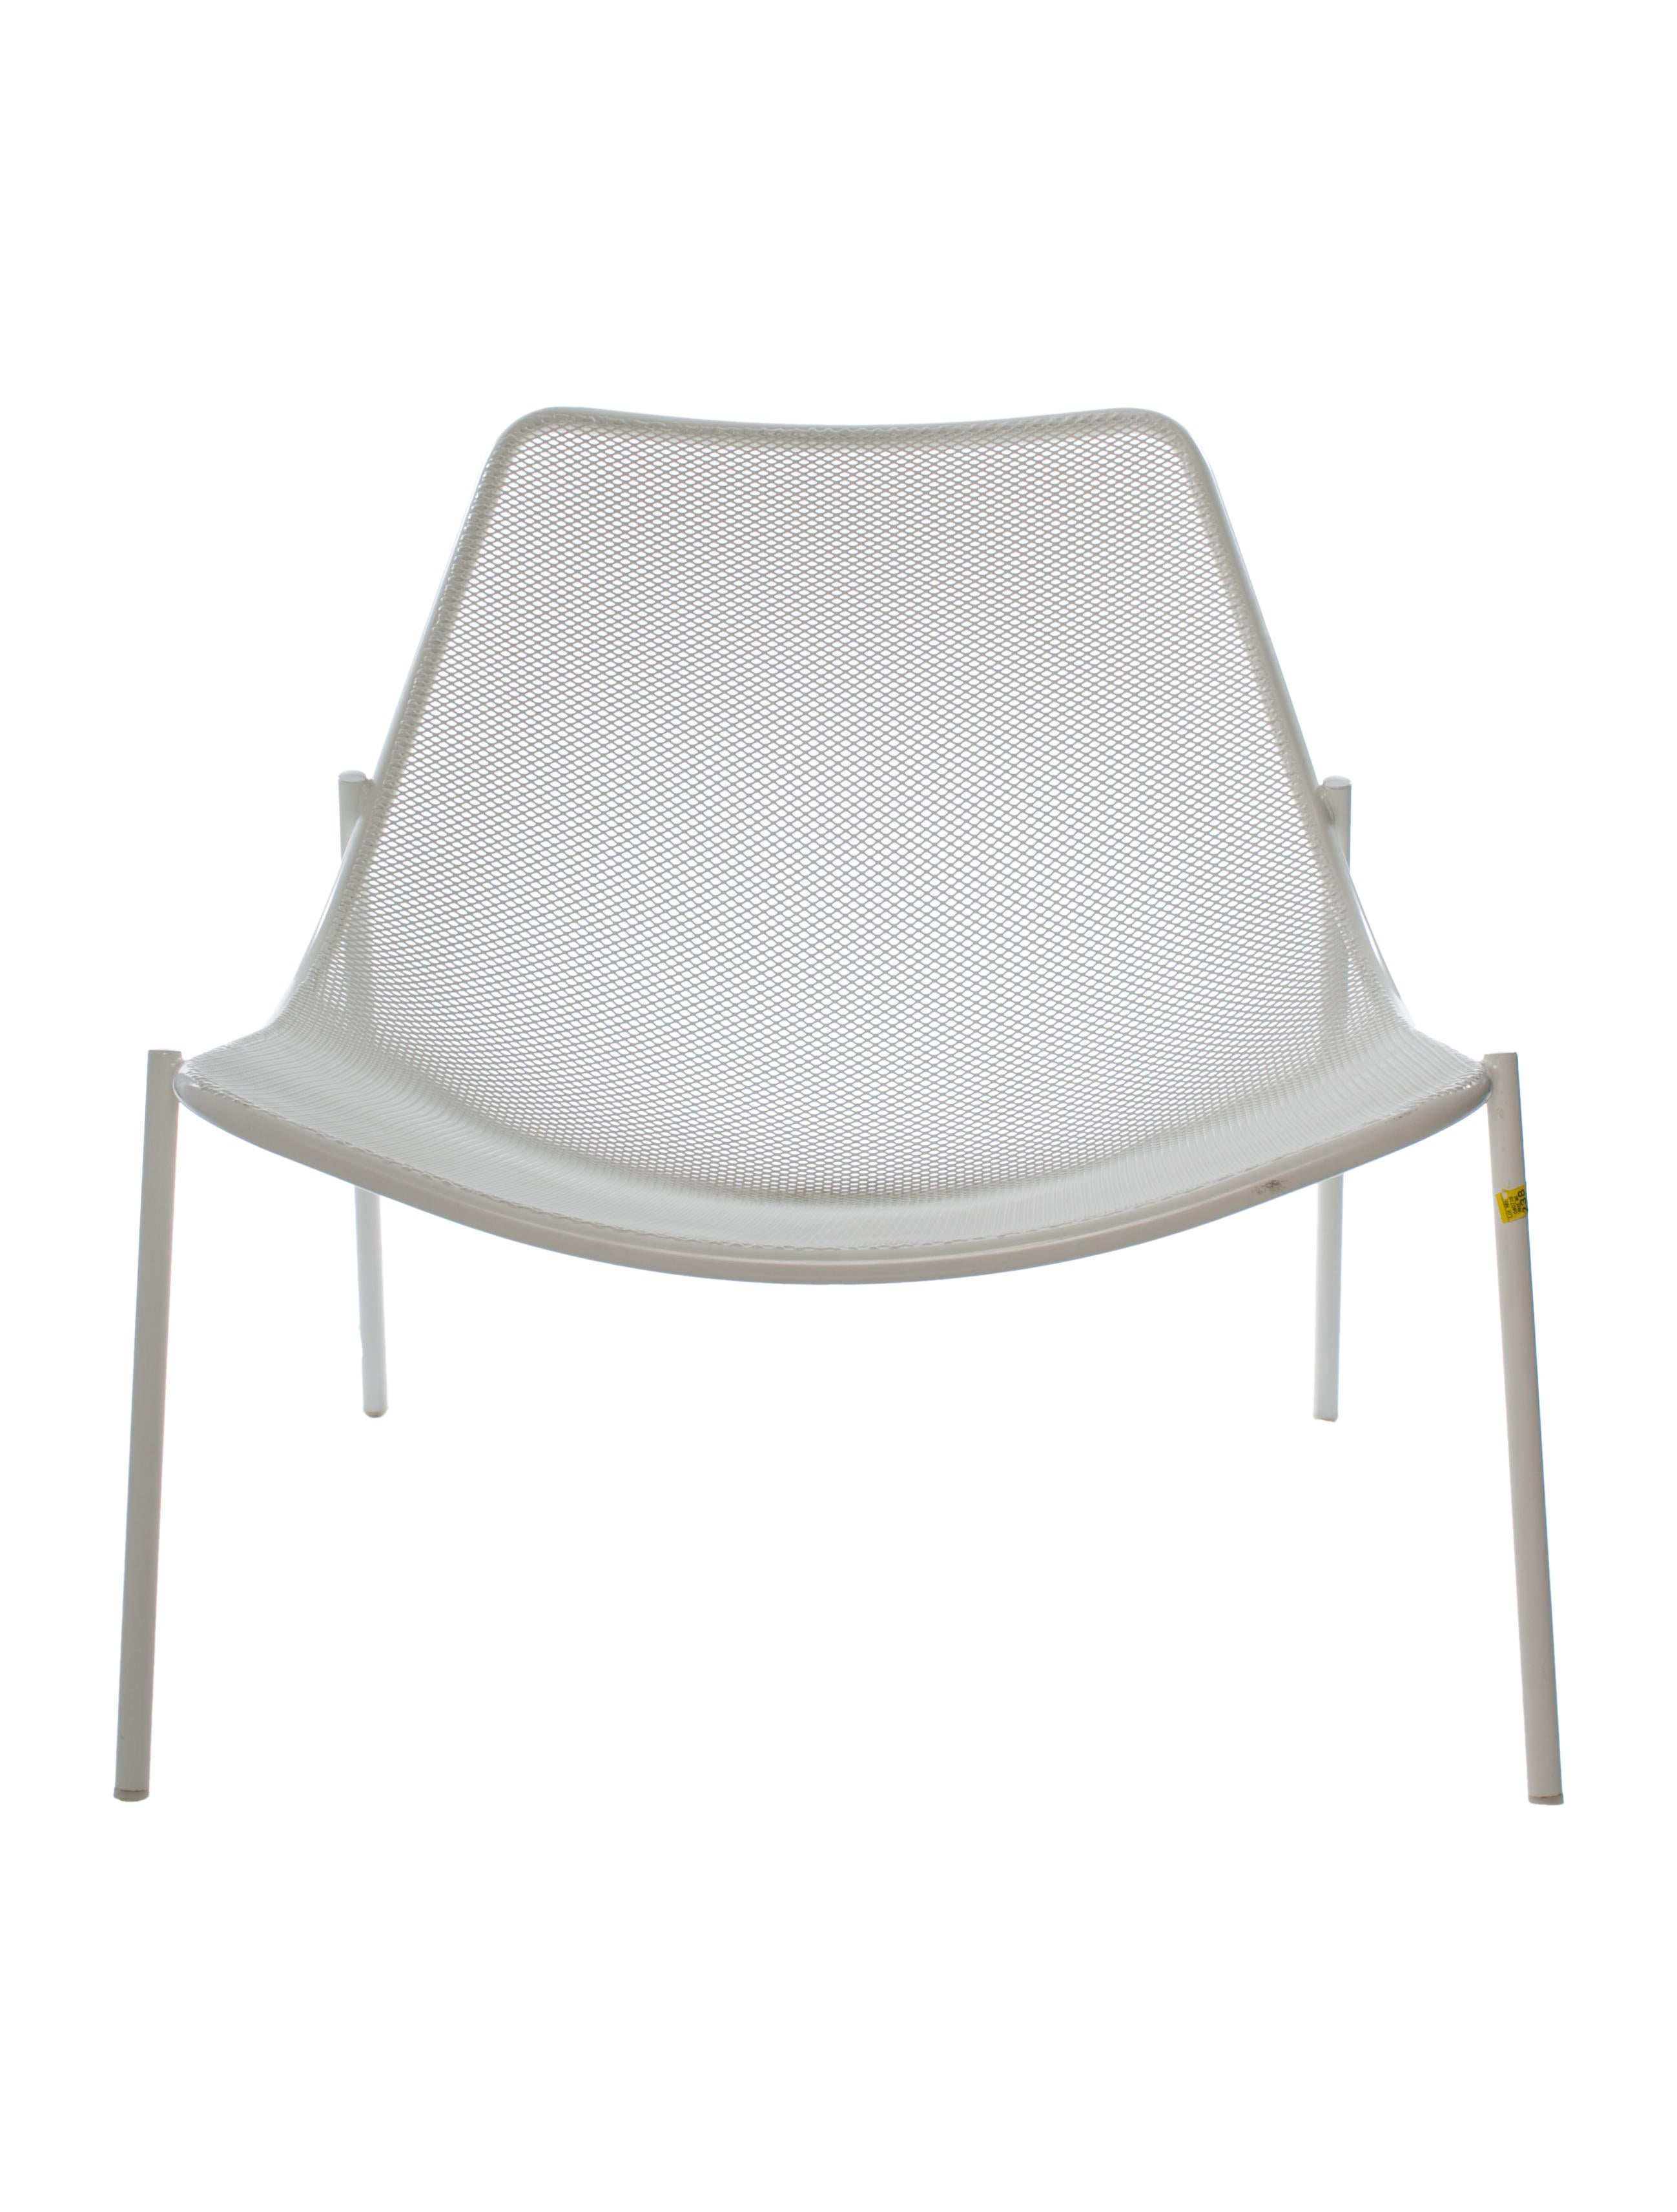 Emu Round Lounge Chairs Furniture HME